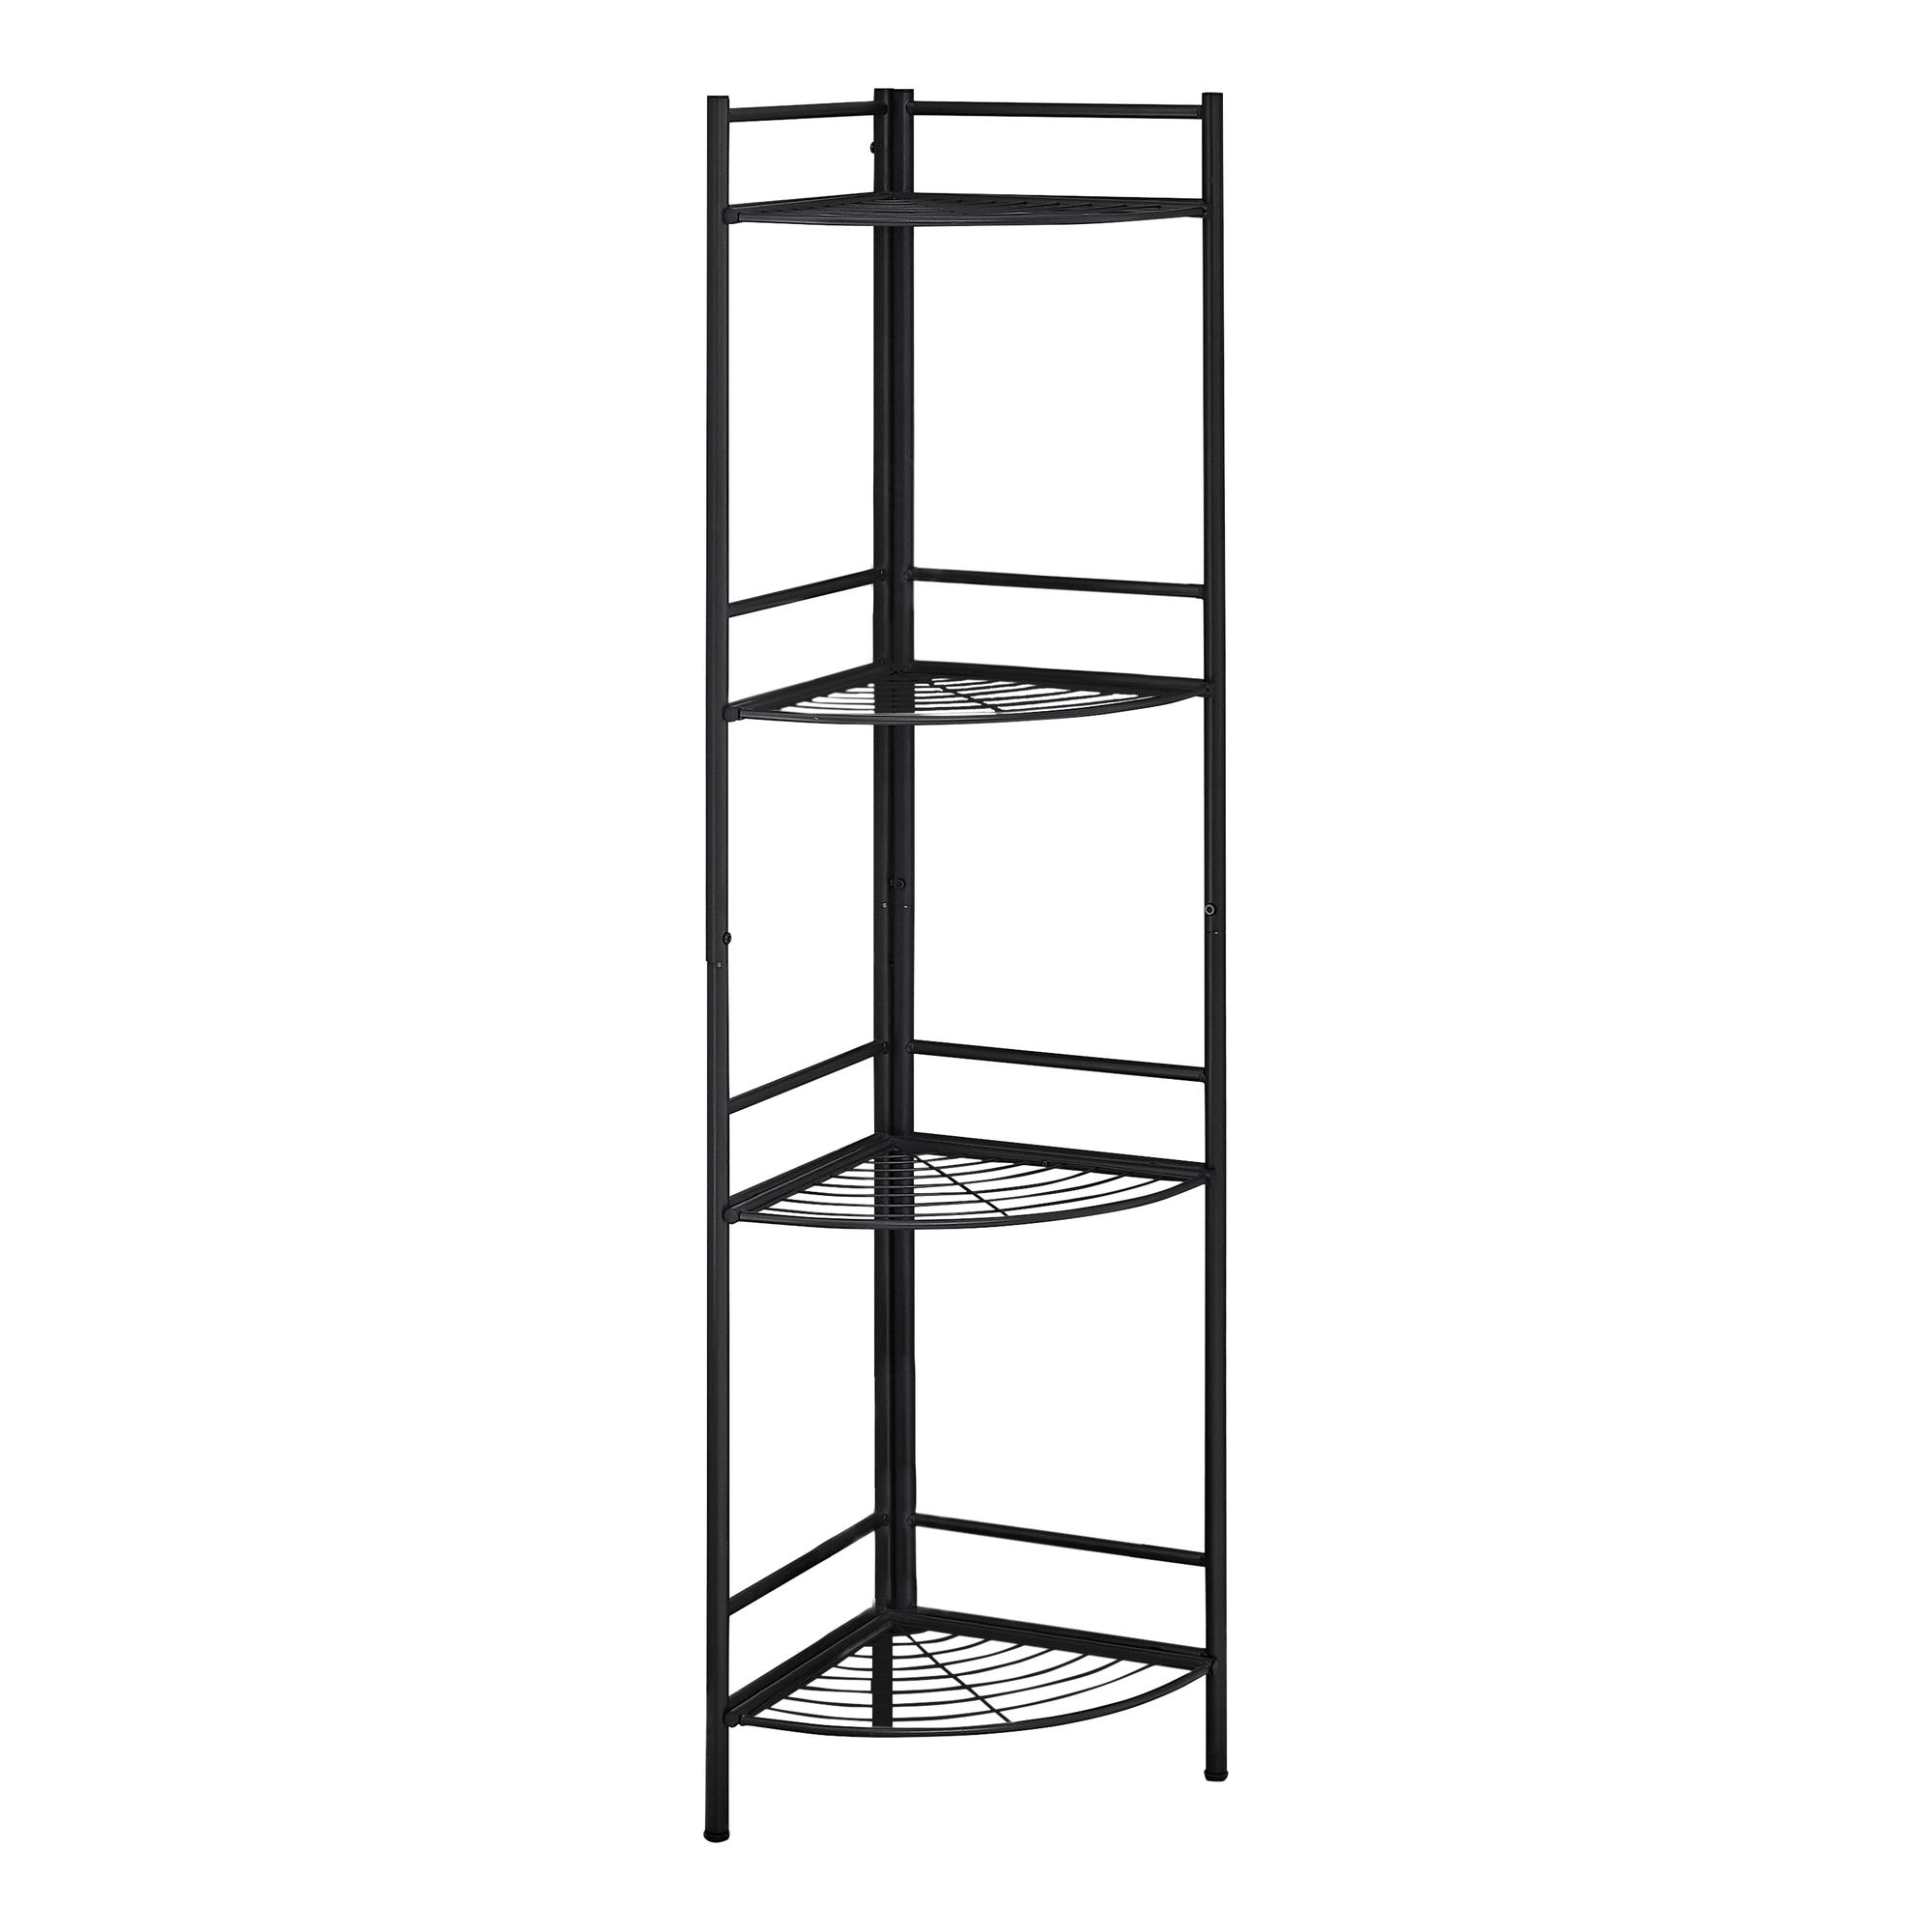 "18.5"" X 13.5"" X 57.75"" Black Metal Corner Etagere Bookcase"